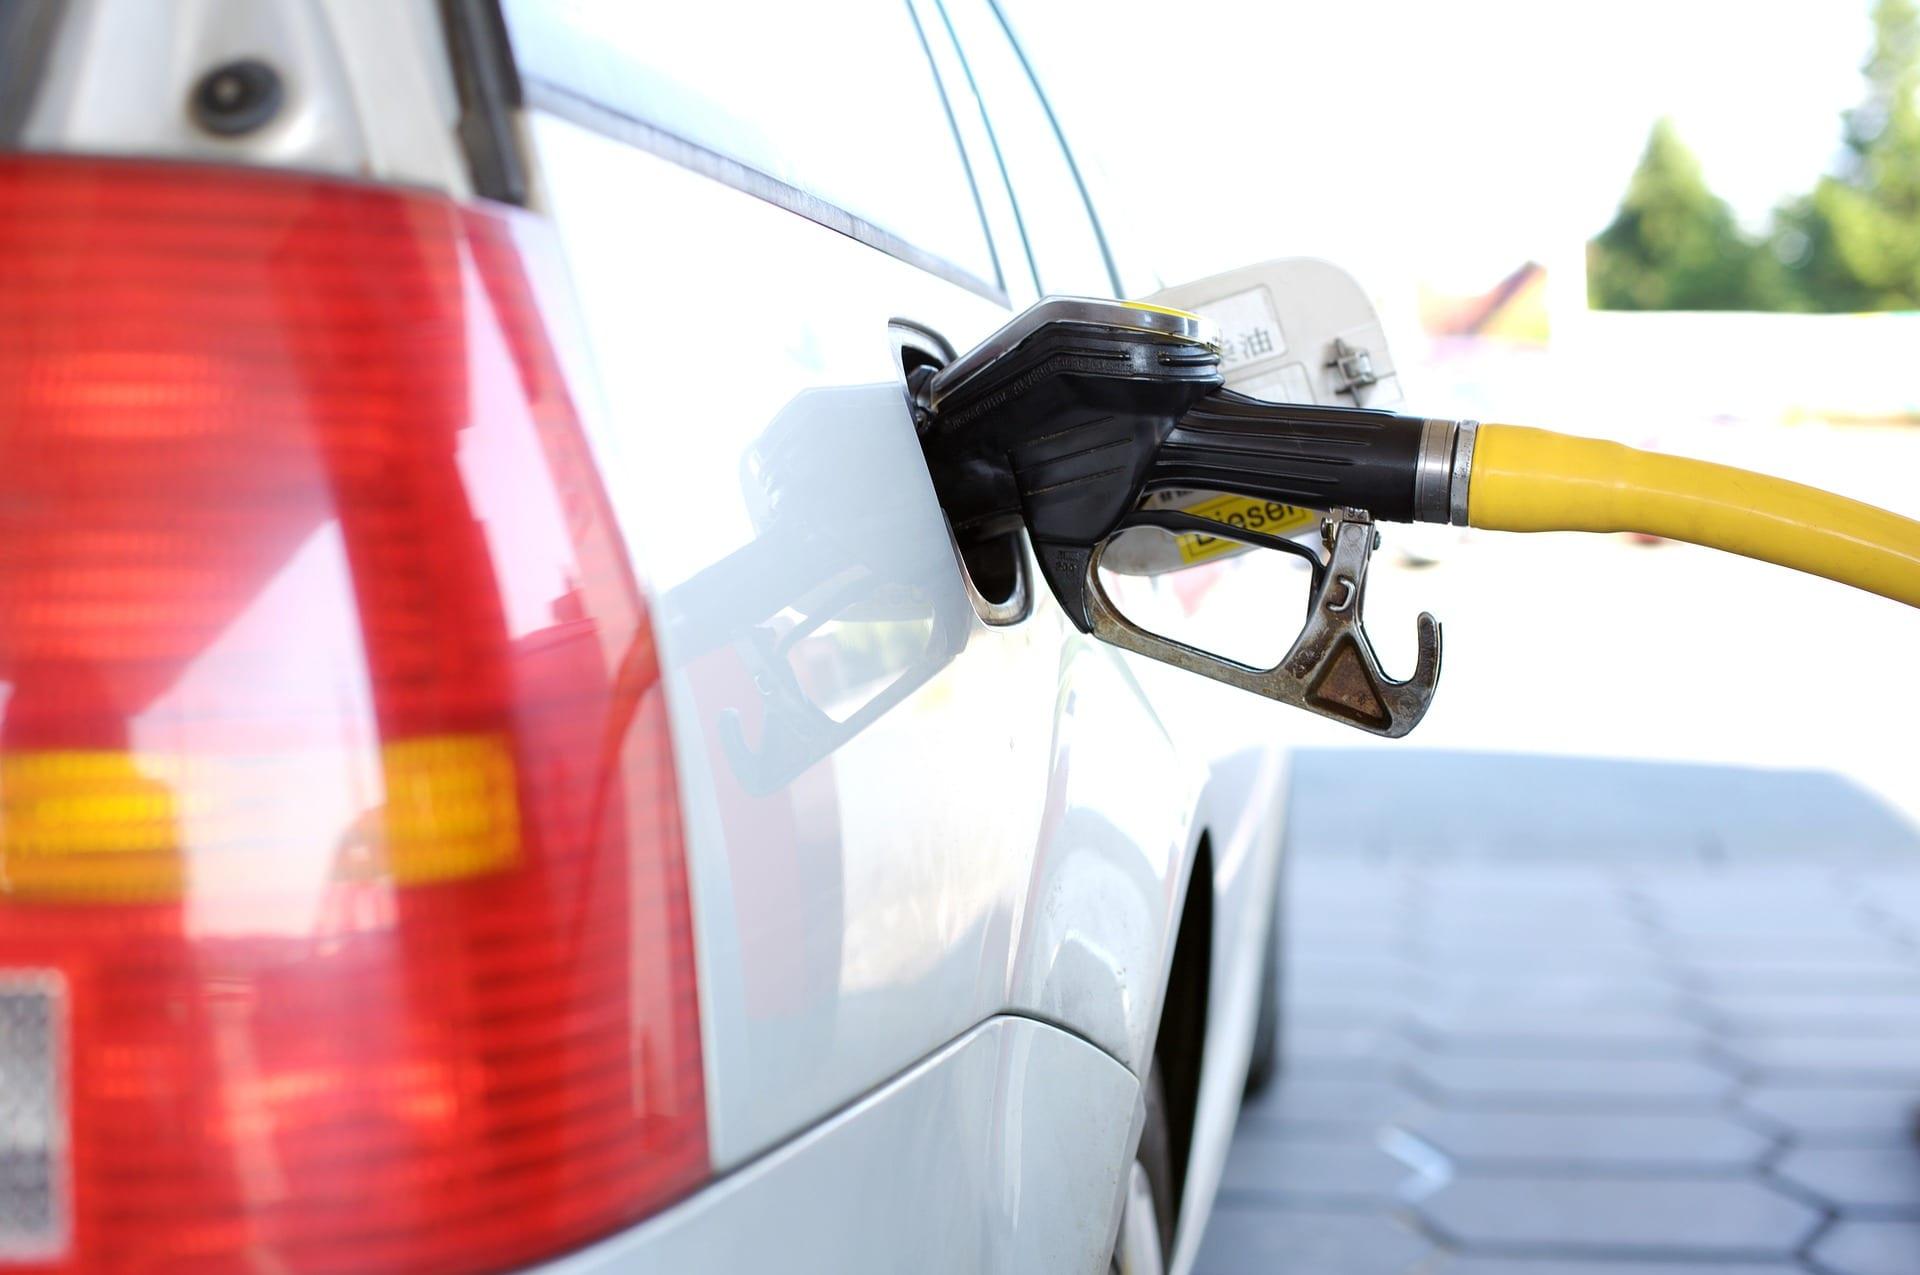 Petrol pump in car